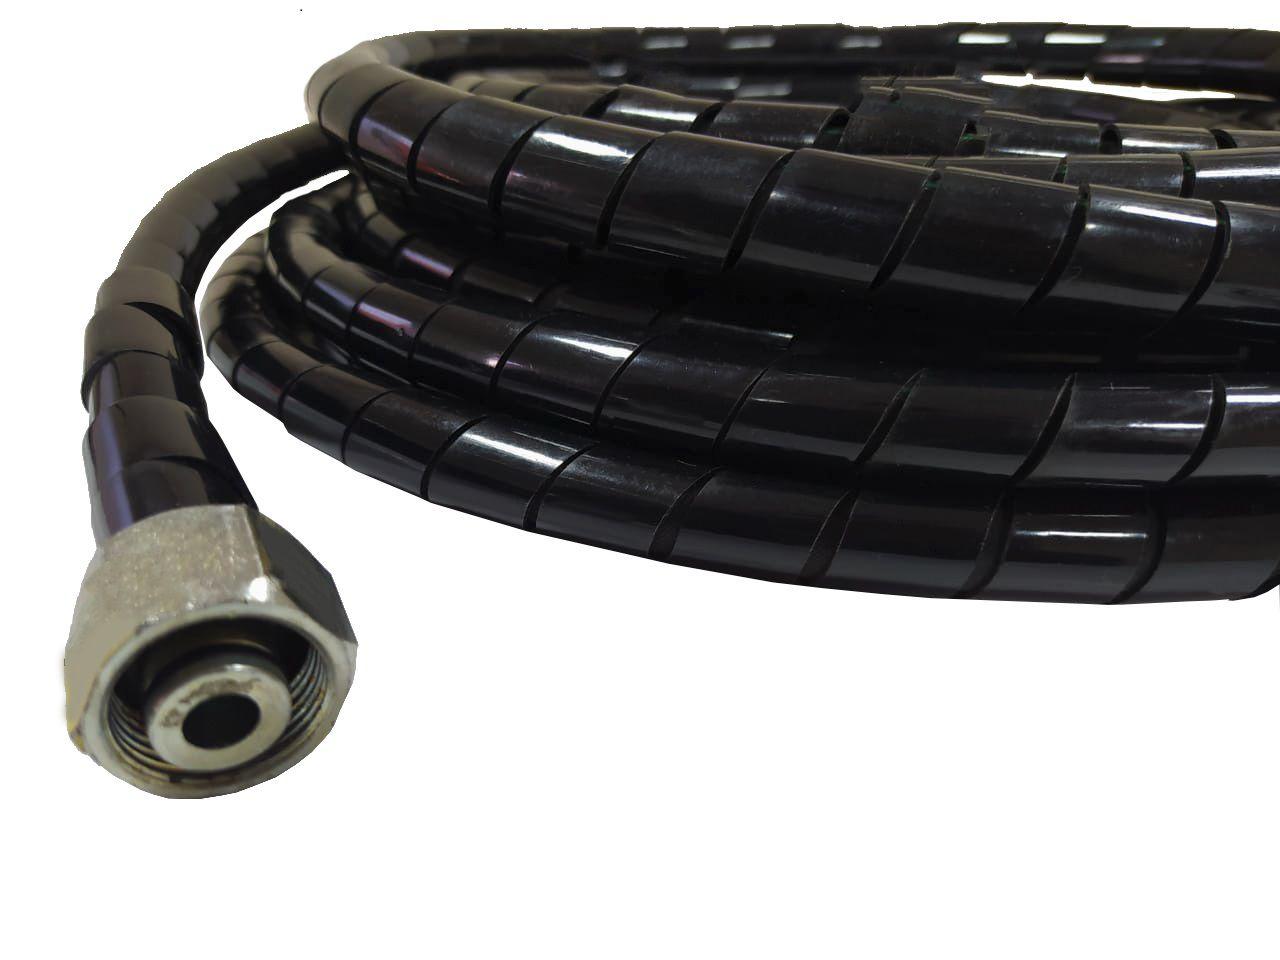 Mangueira Lavadora Karcher Trama Aço Hd 585 Profis 10 Mts C/ Proteção Aspiral